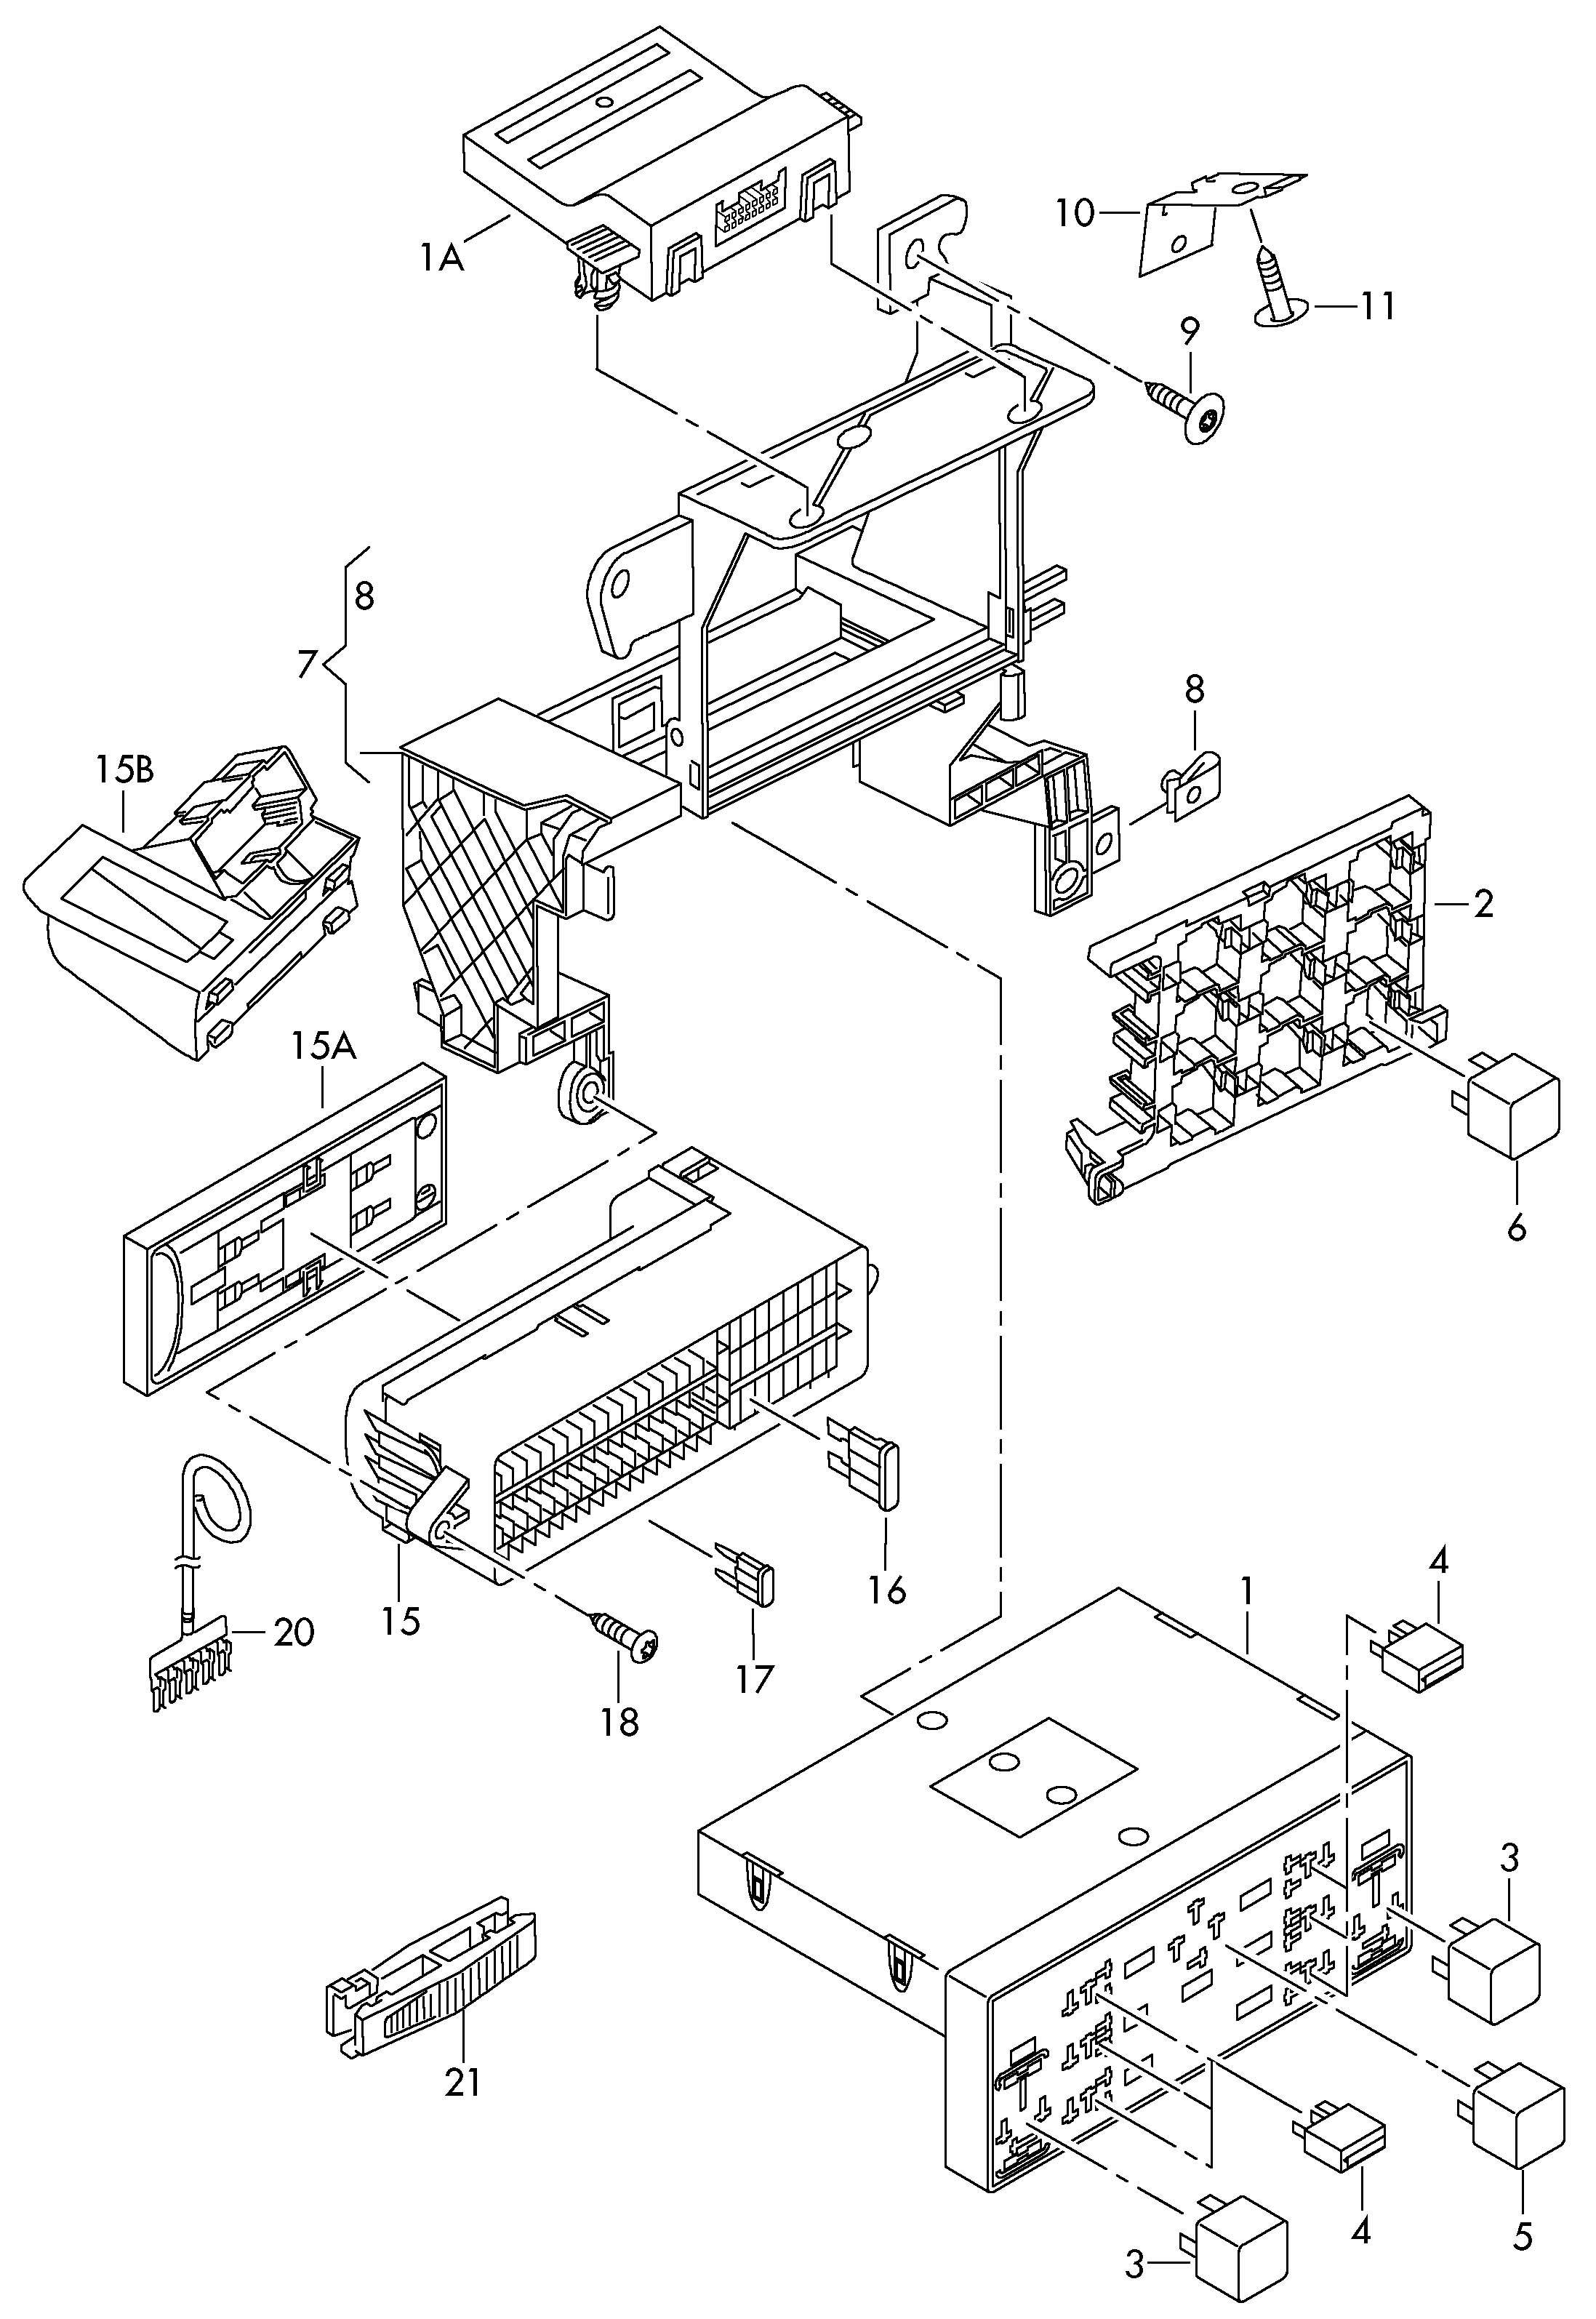 vw tiguan trailer wiring diagram wiring diagram and schematic design trailer wiring harness diagram diagrams and schematics